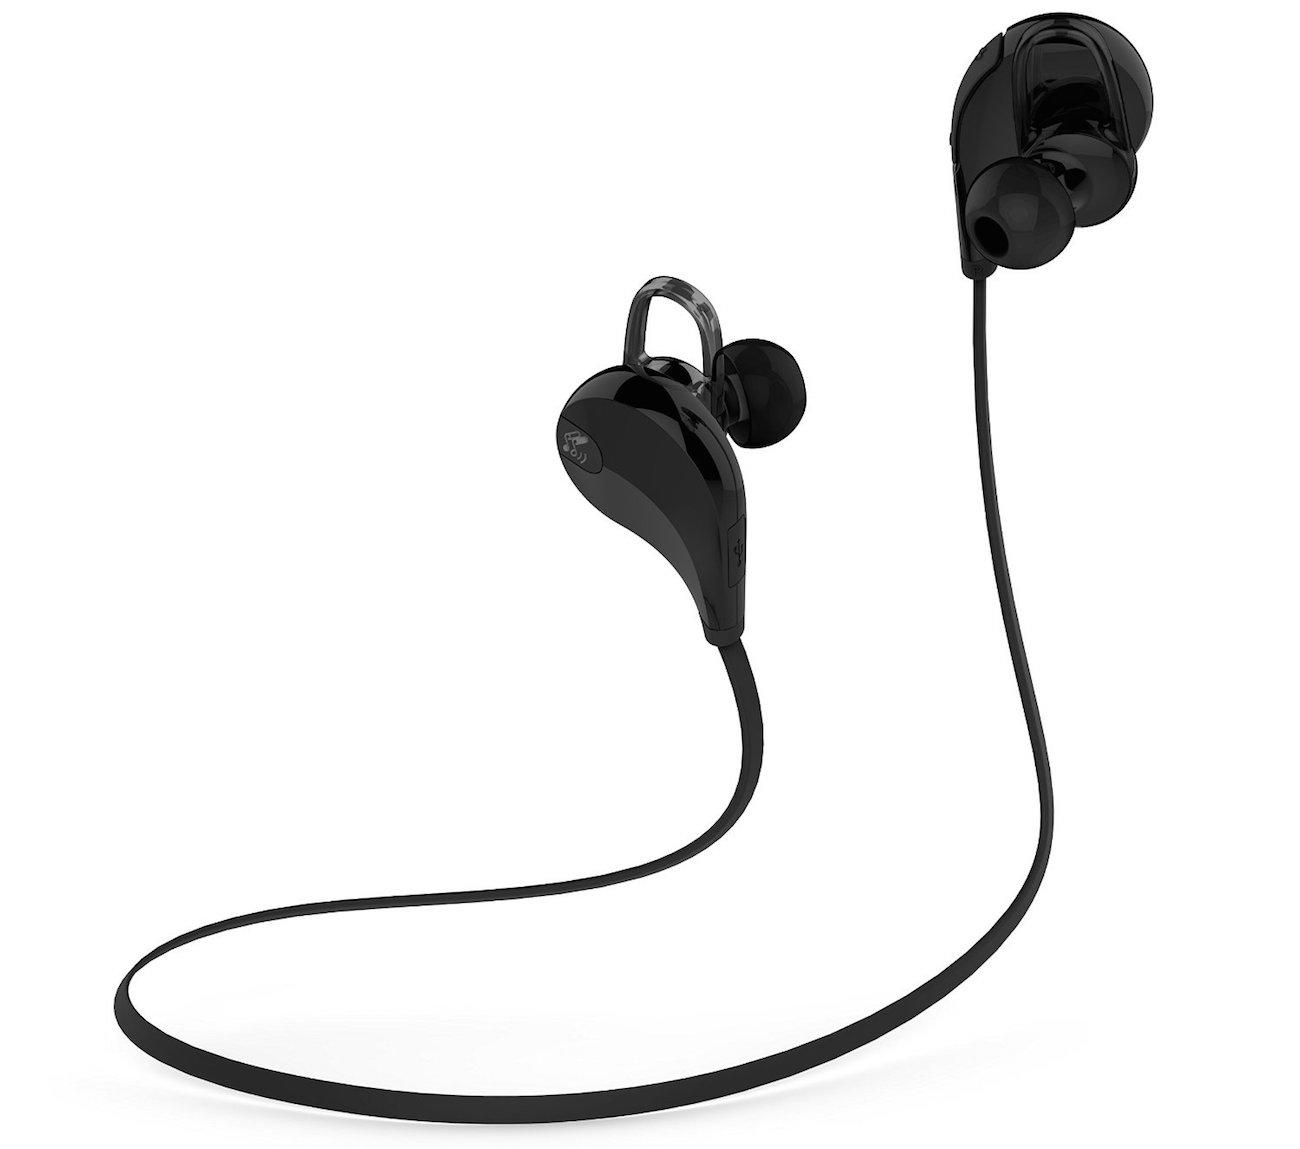 Bluetooth Mini Lightweight Wireless Earbuds by Soundpeats